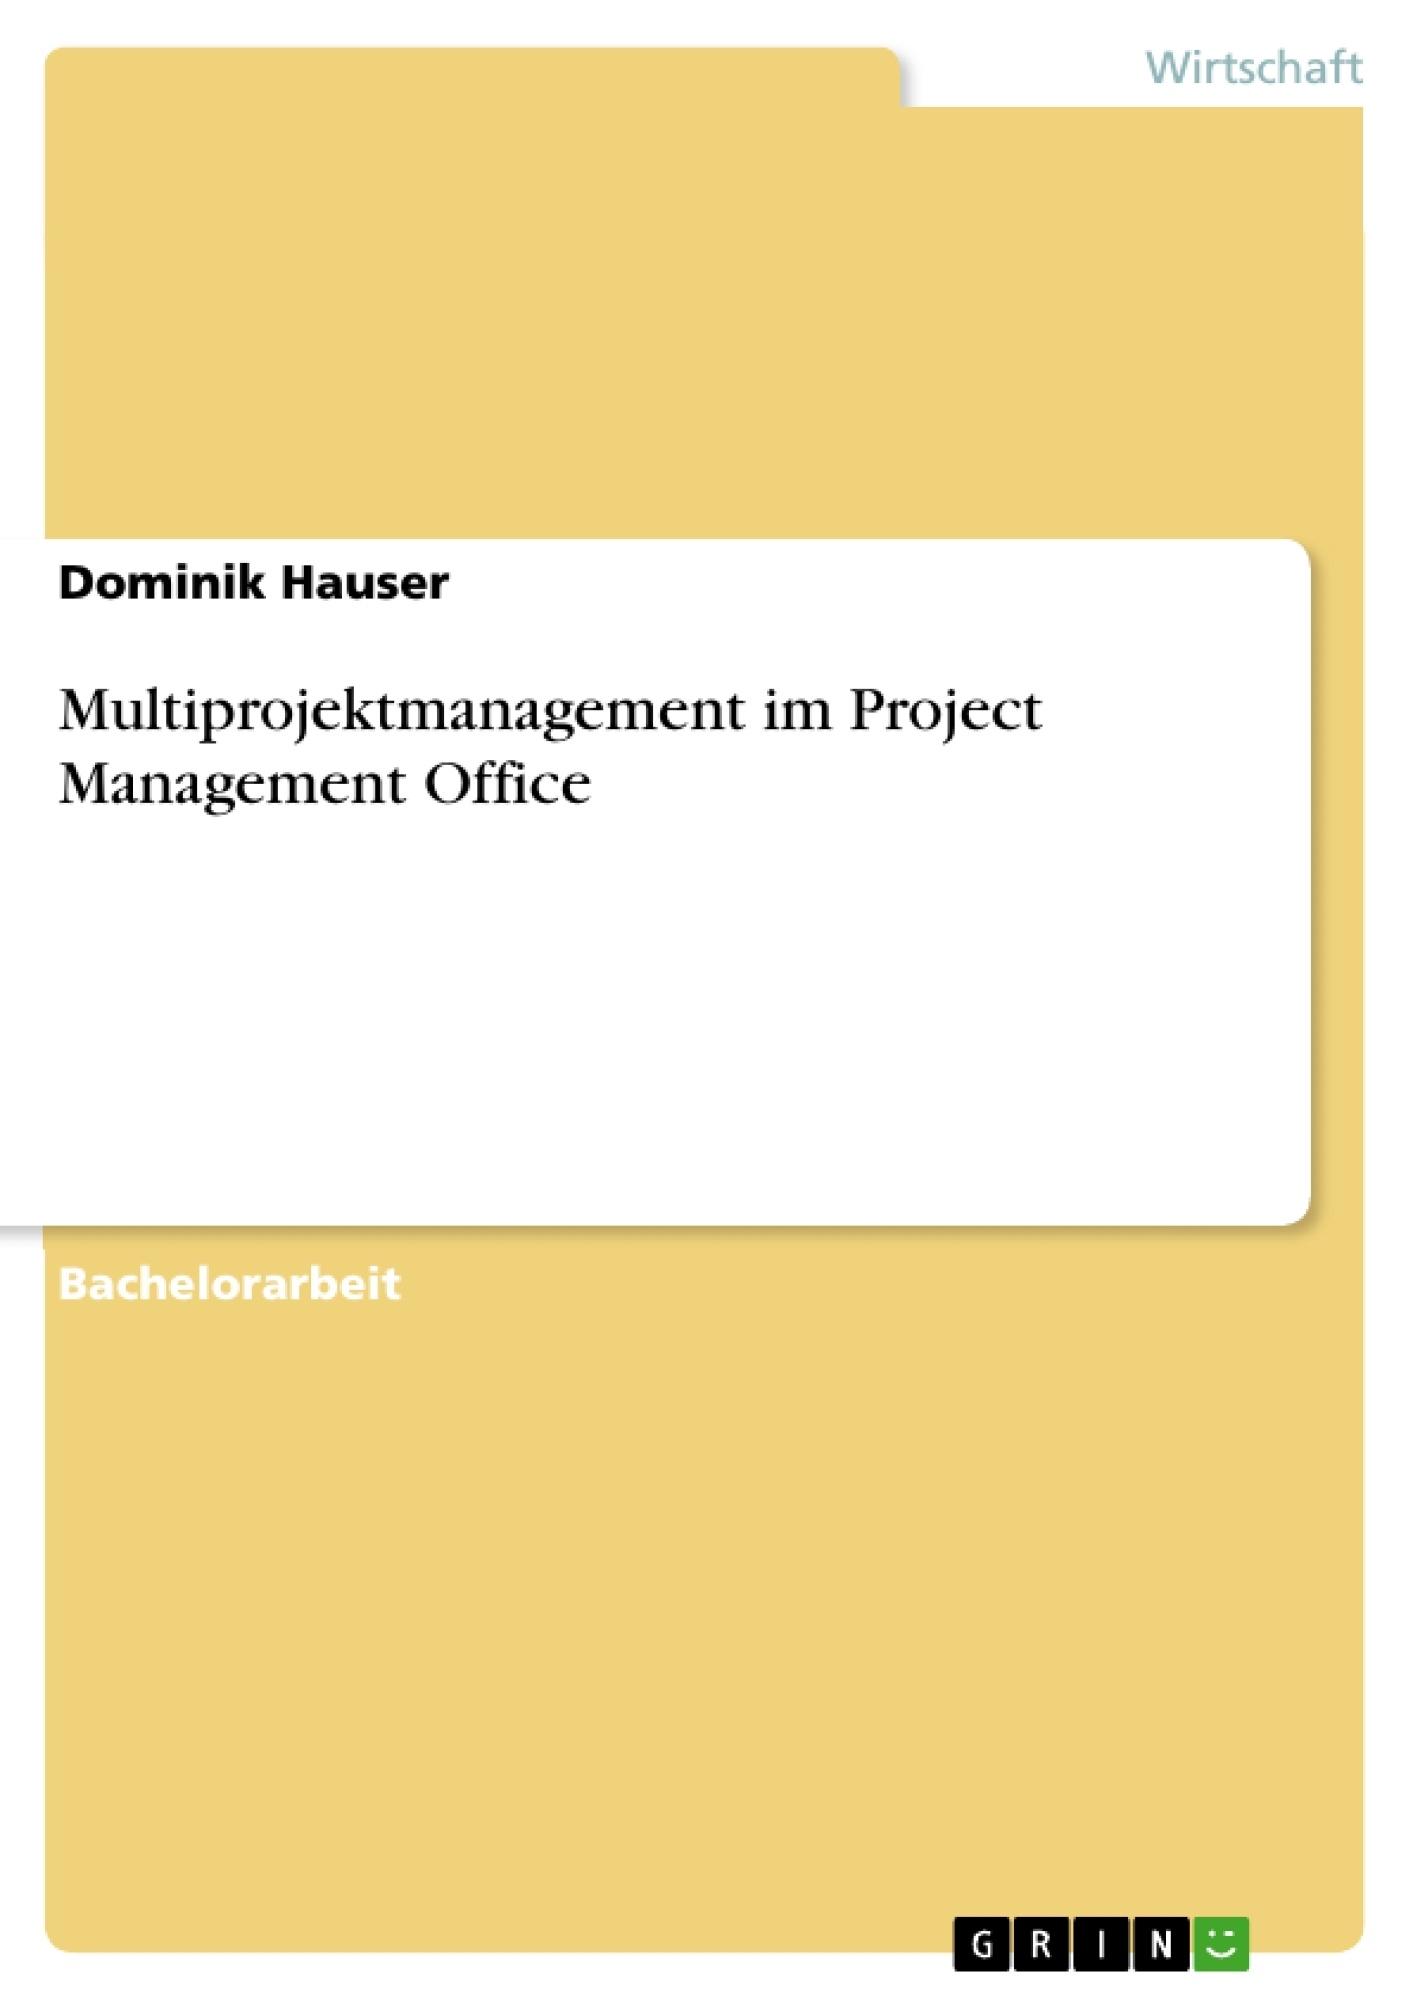 Titel: Multiprojektmanagement im Project Management Office